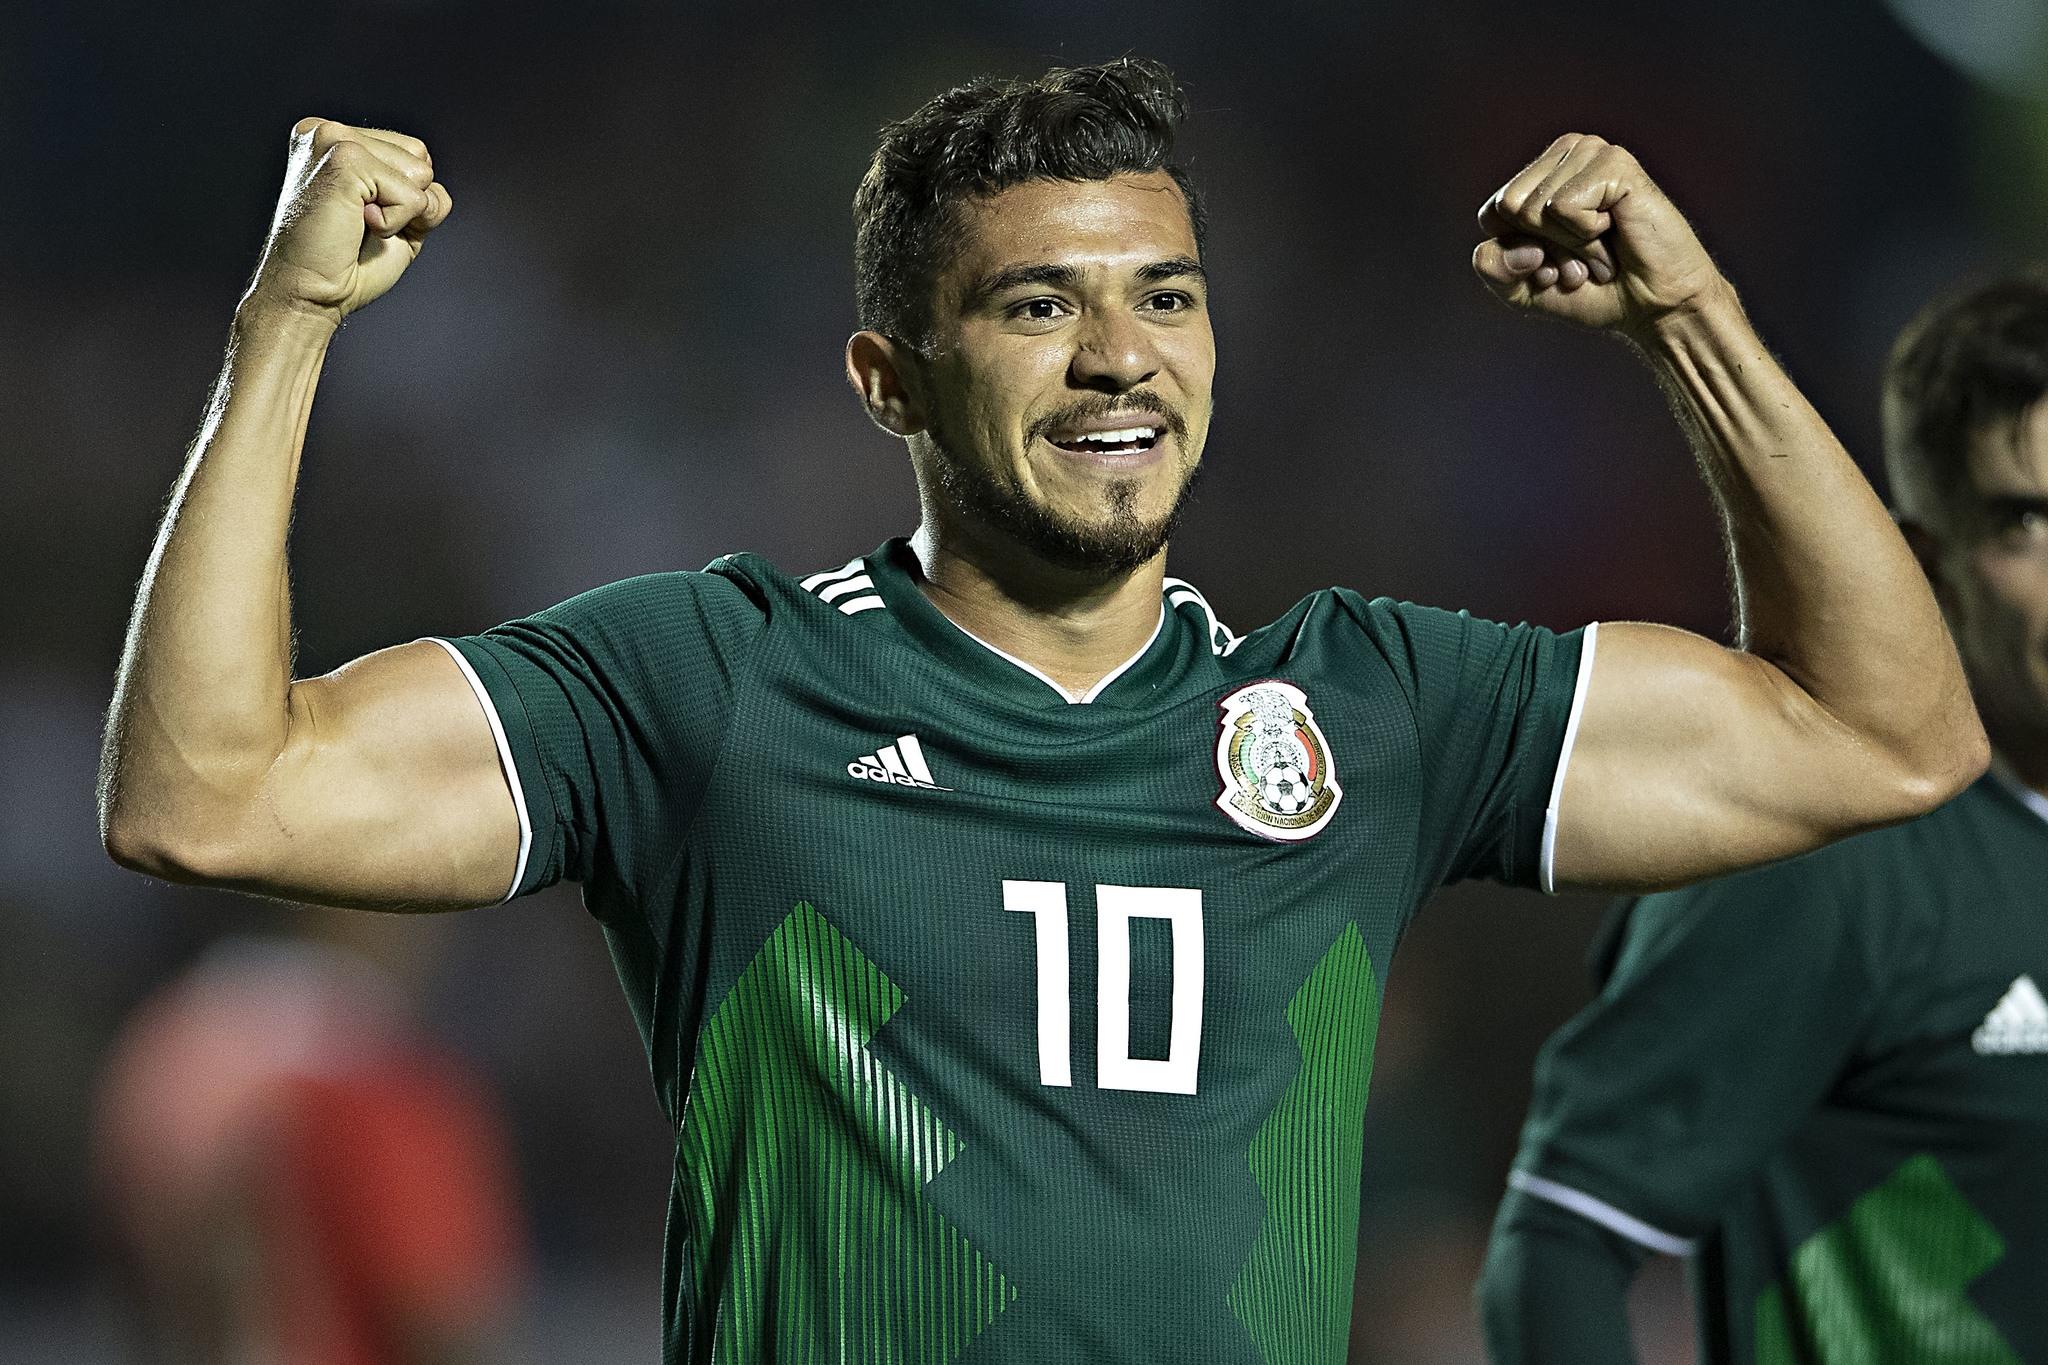 Resultado de imagen para México vs Costa Rica henry martin